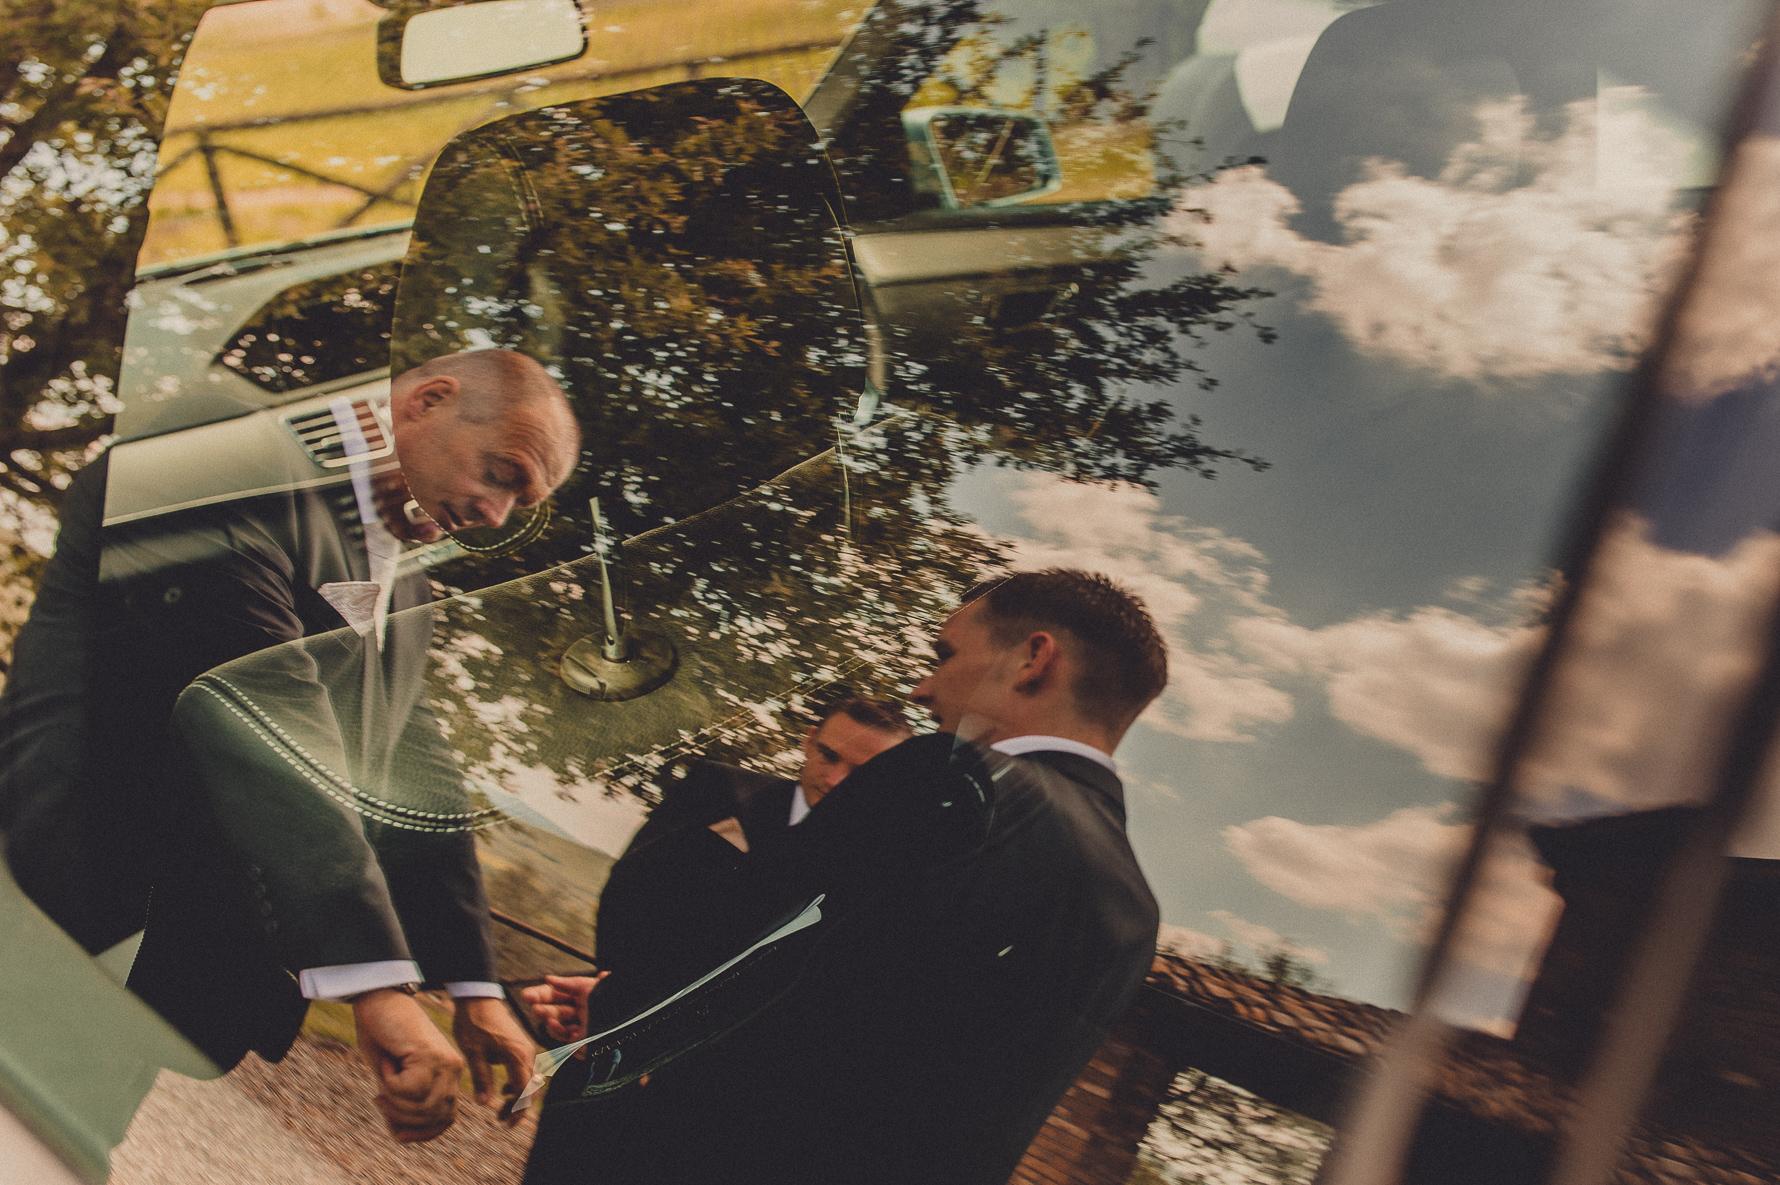 Valdambra wedding photographer - Livio Lacurre